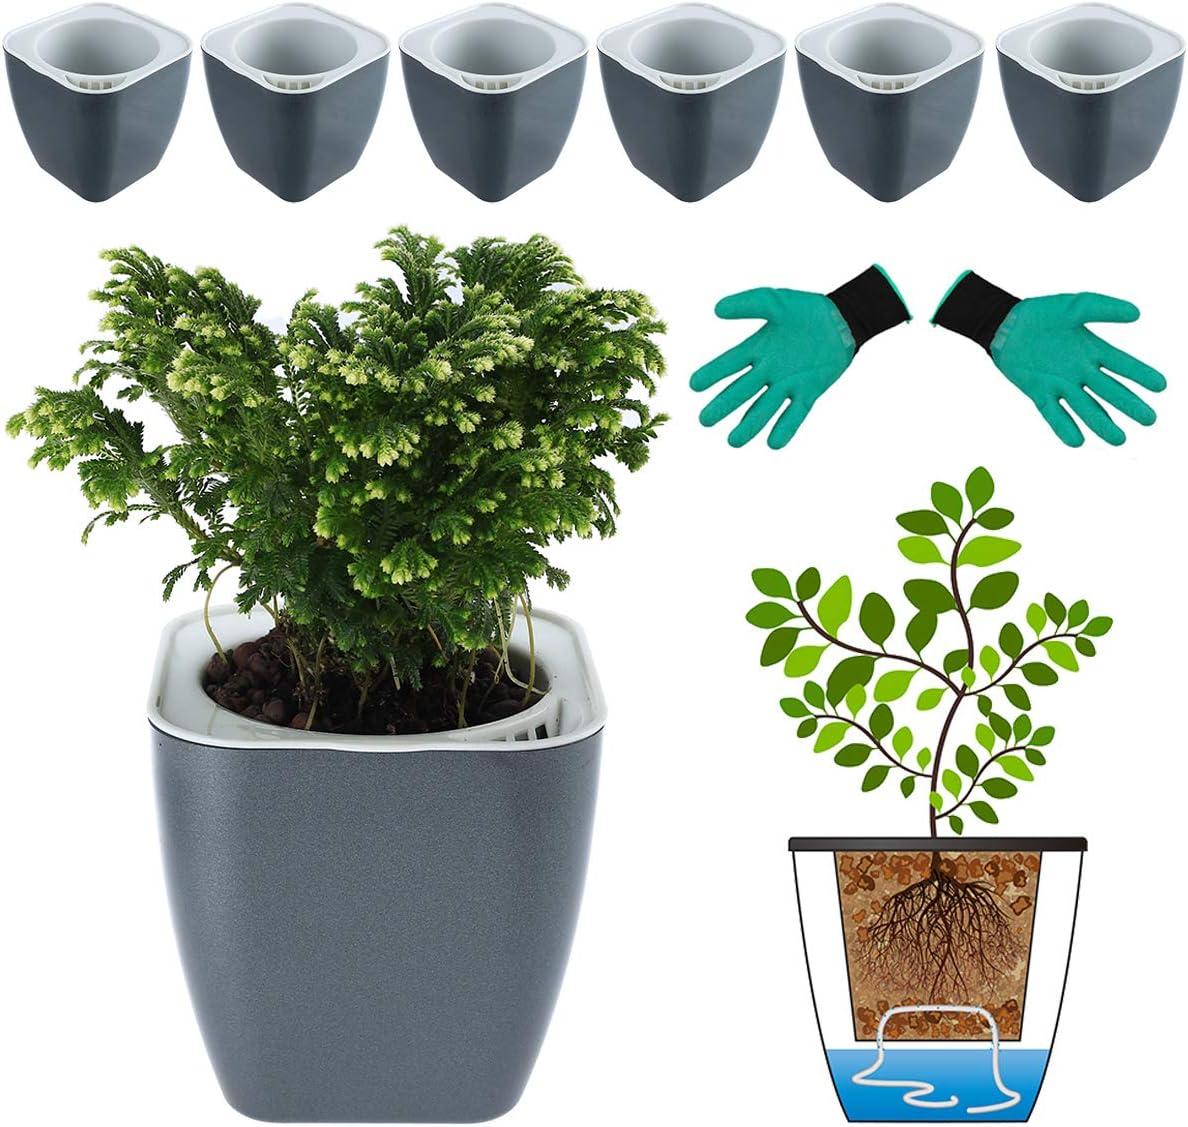 Watering Planter Plastic Clear Self Watering Flower Pot Water Storage Basin @